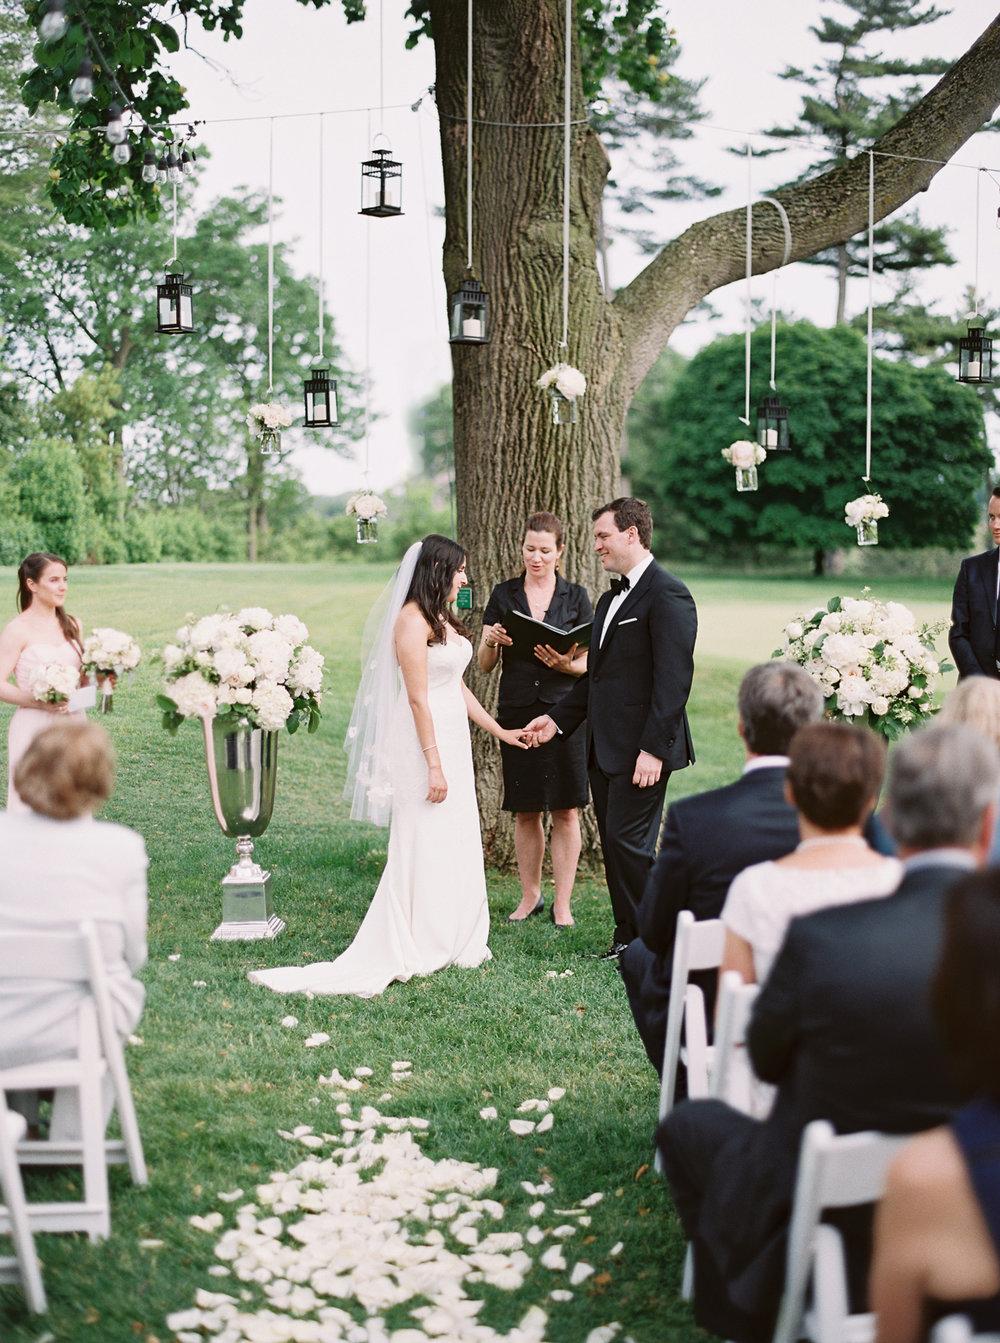 0446-Nadia-Chris-Married-When He Founf Her-Toronto Golf Club.jpg